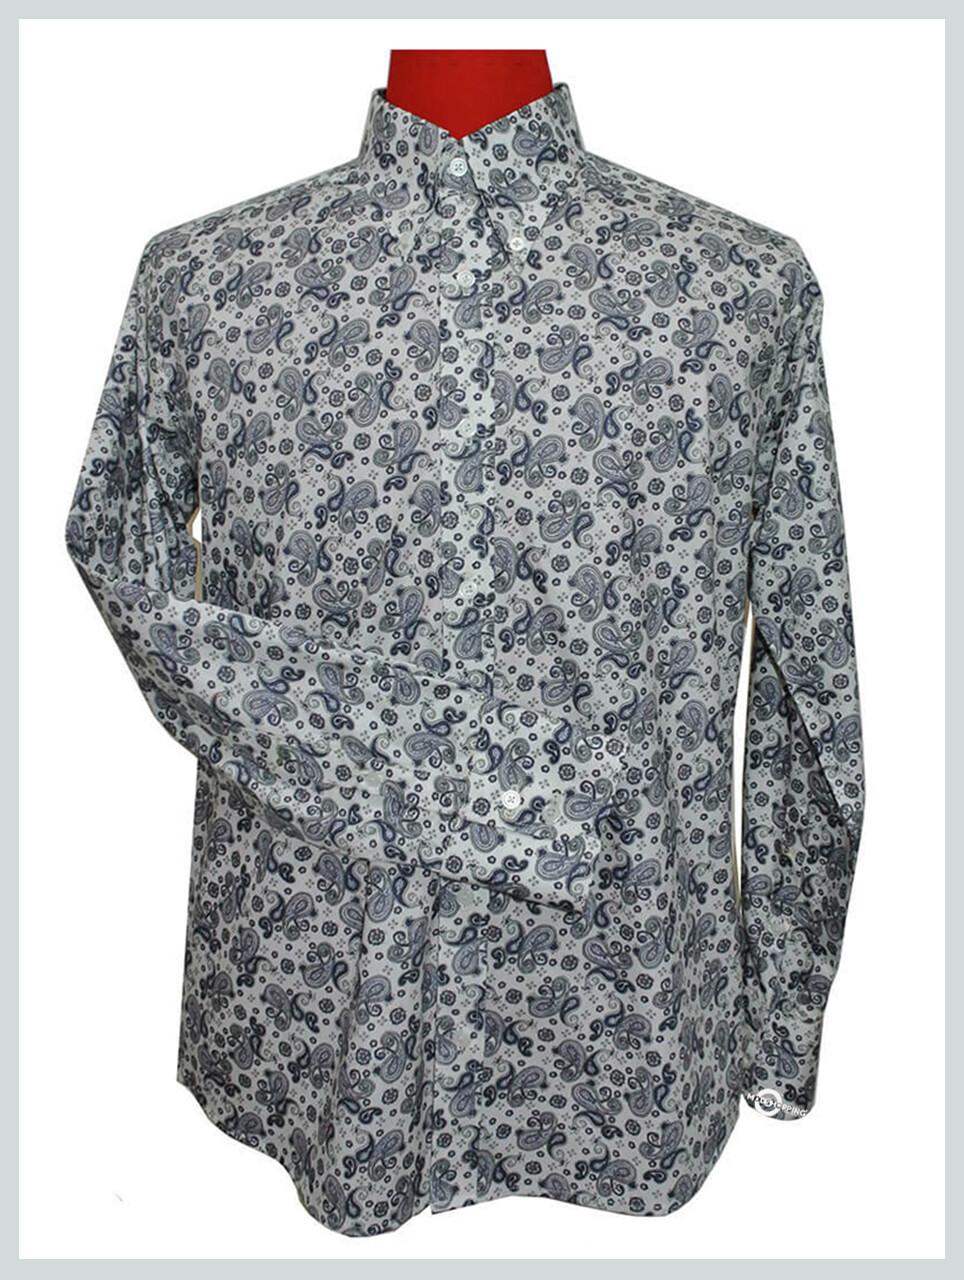 Paisley Shirt| Grey 60s Retro Paisley Mod Shirt For Men